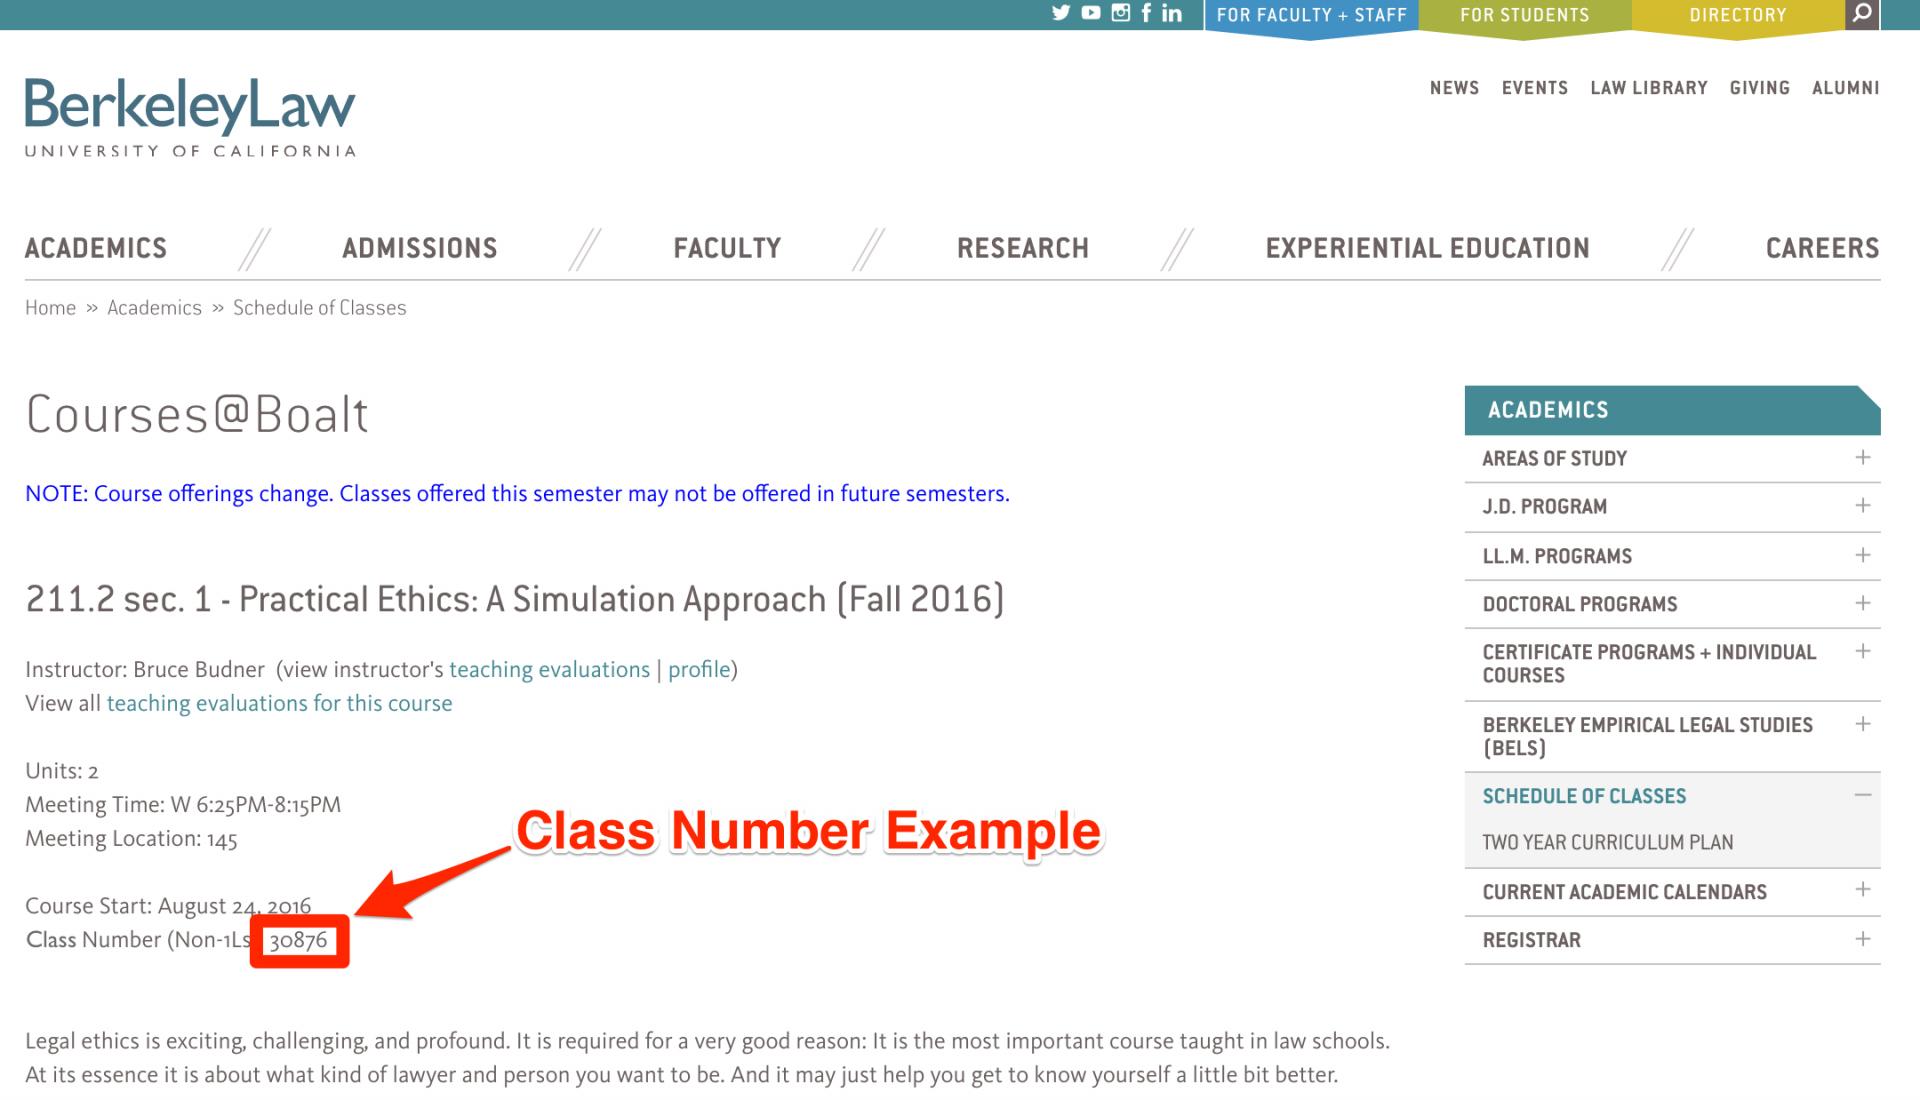 Registration | Berkeley Law pertaining to Berkeley Law Academic Calendar